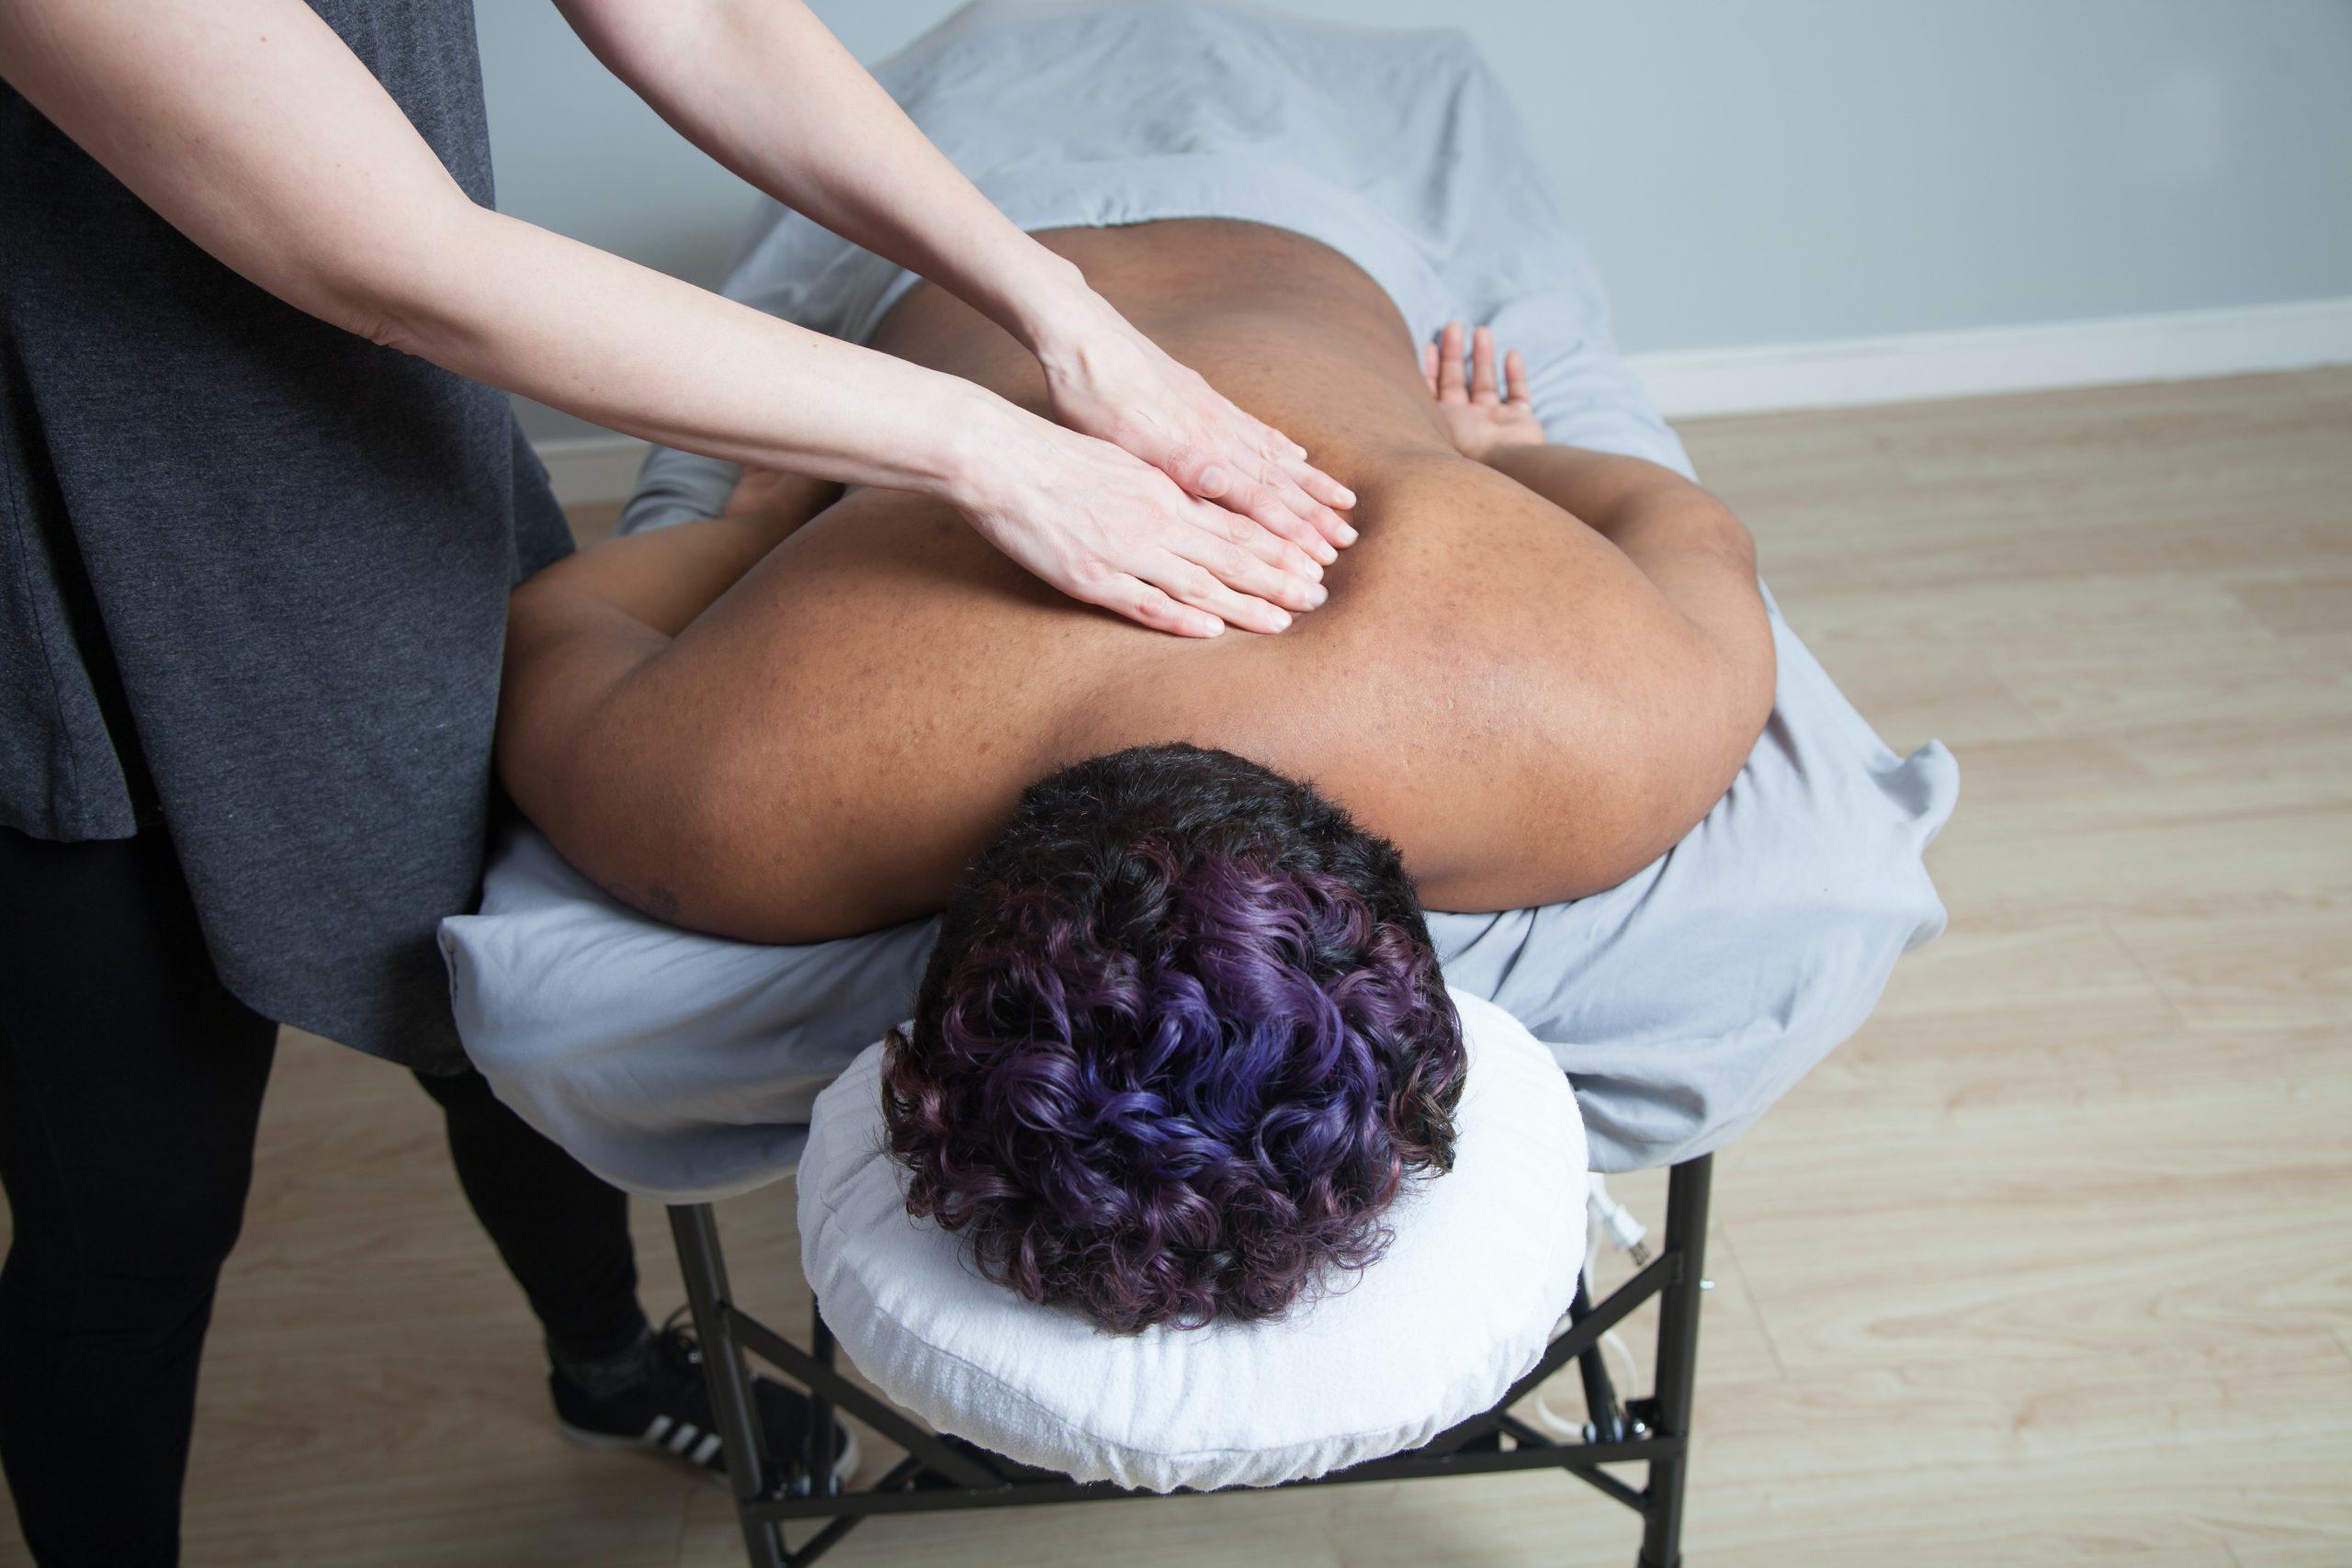 Woman getting back massaged laying down.